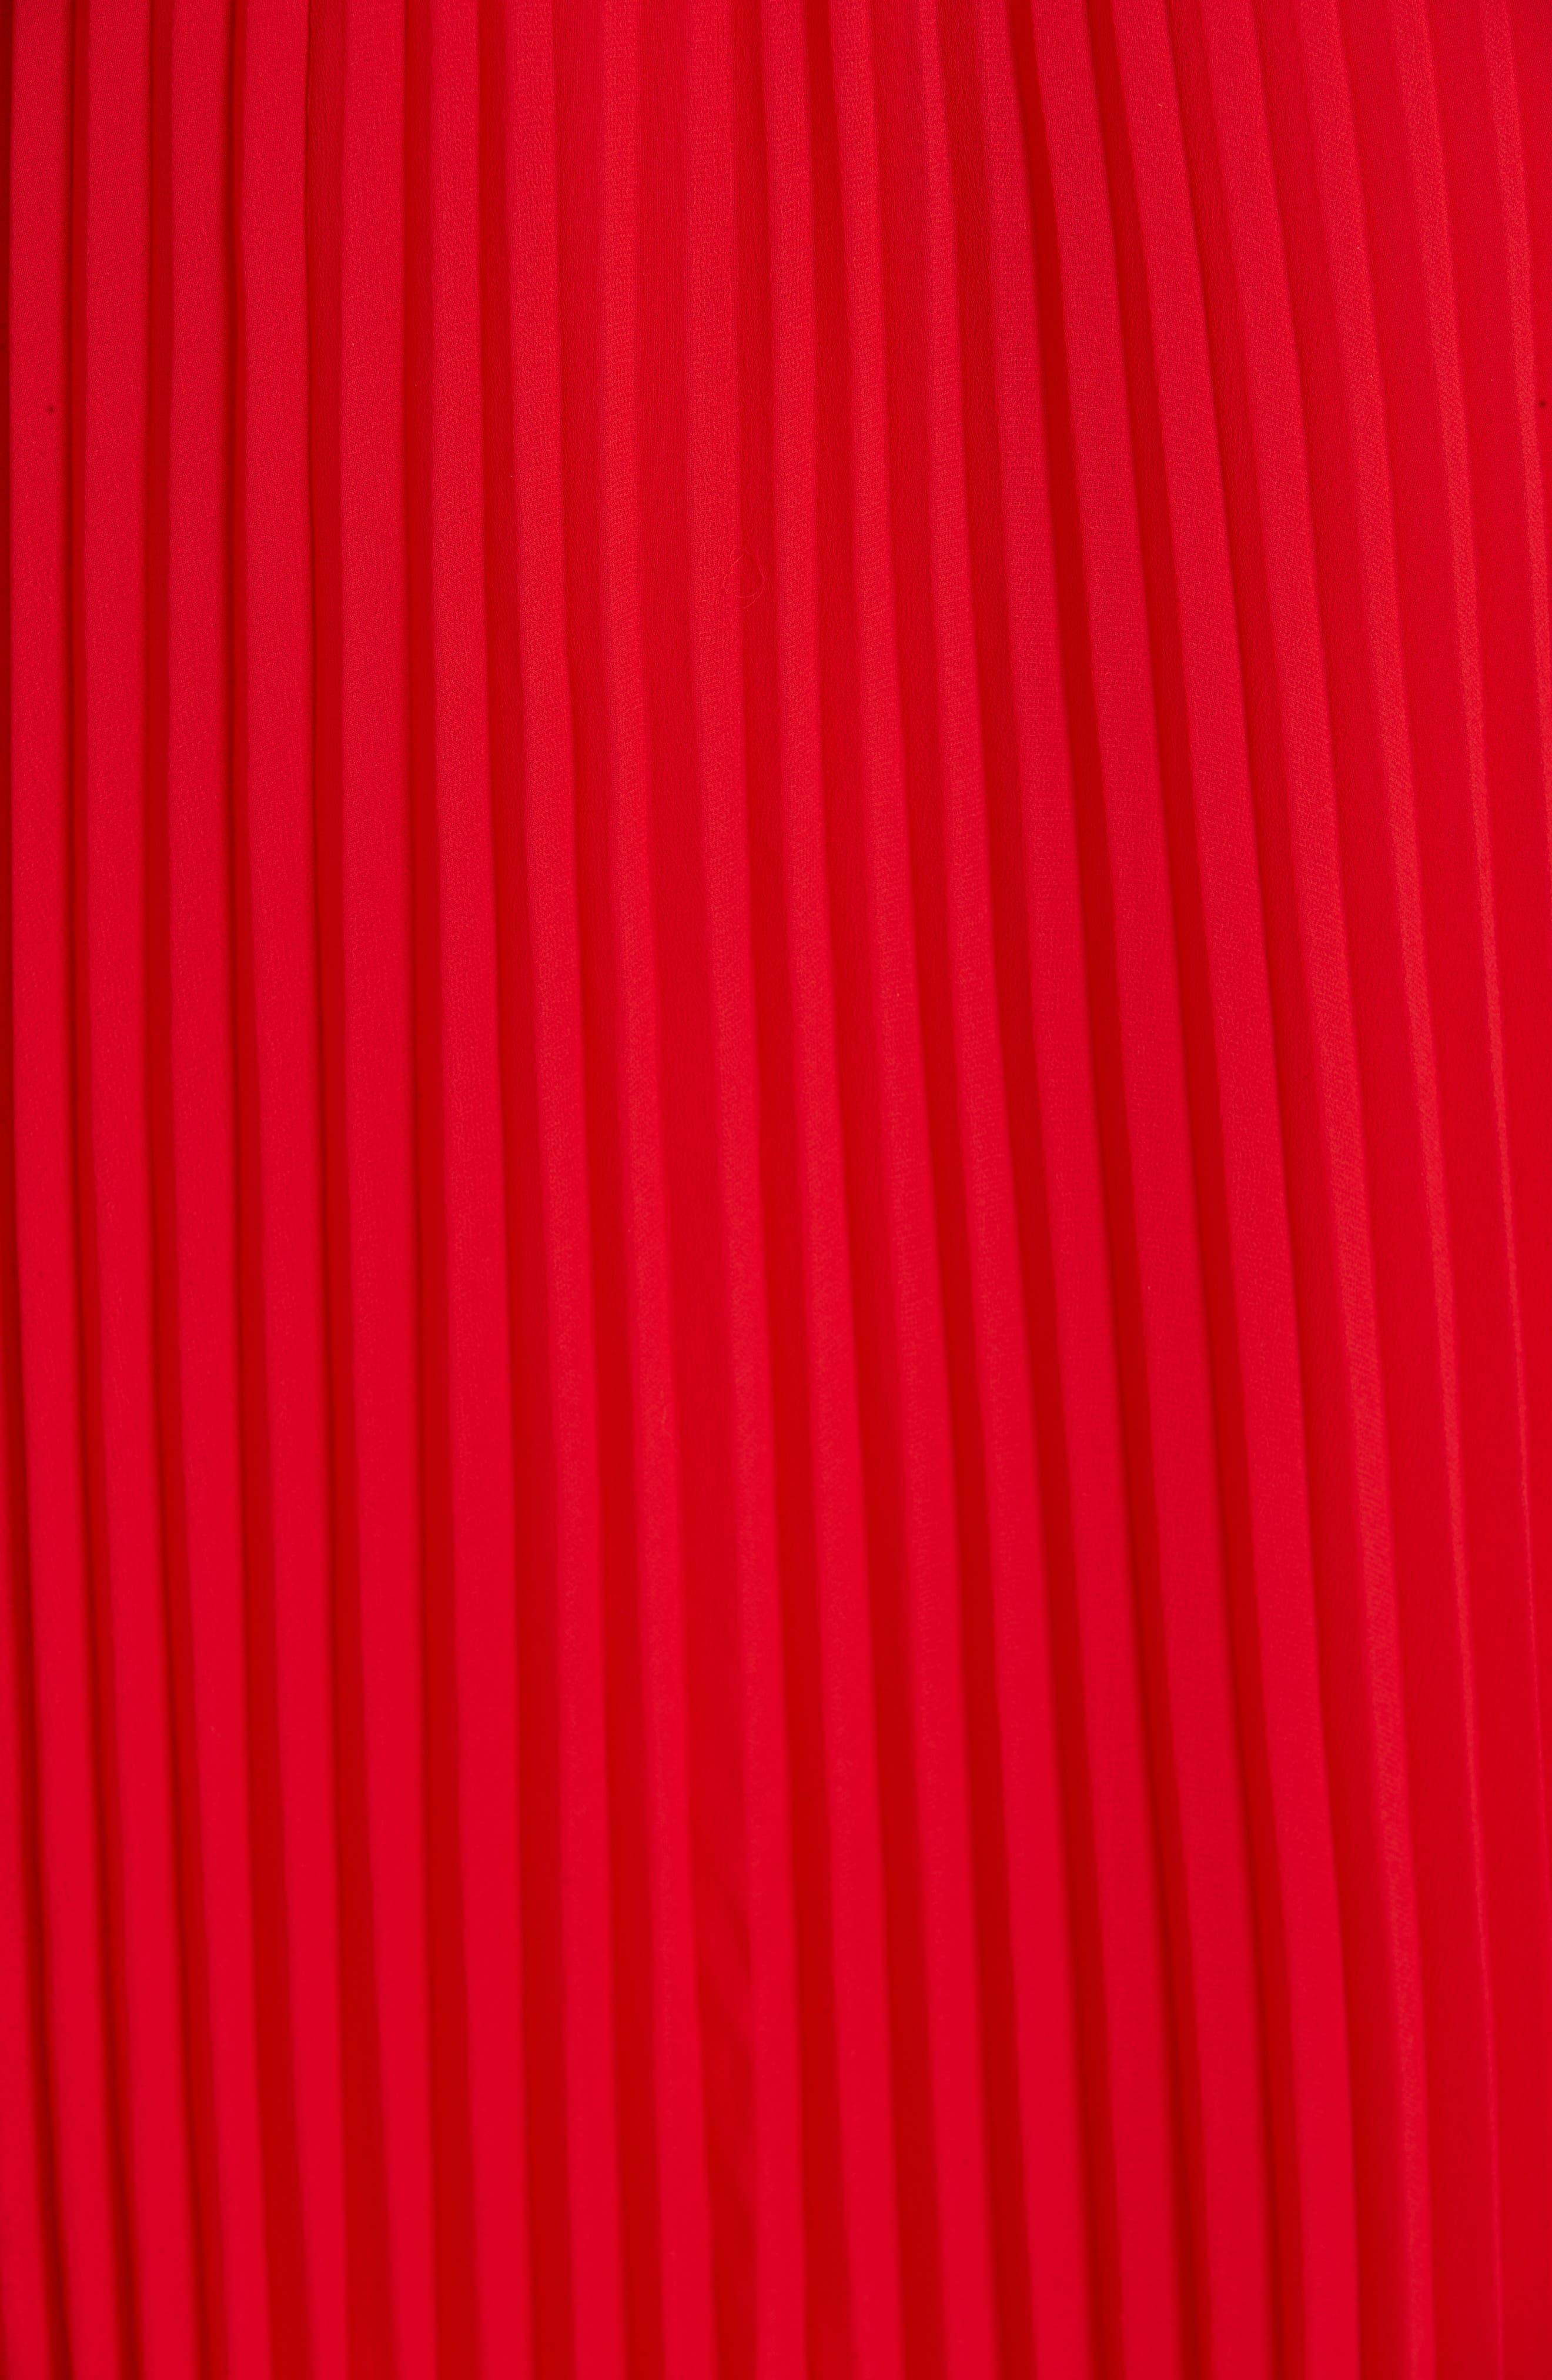 POLO RALPH LAUREN, Pleat Midi Skirt, Alternate thumbnail 5, color, PANDORA RED